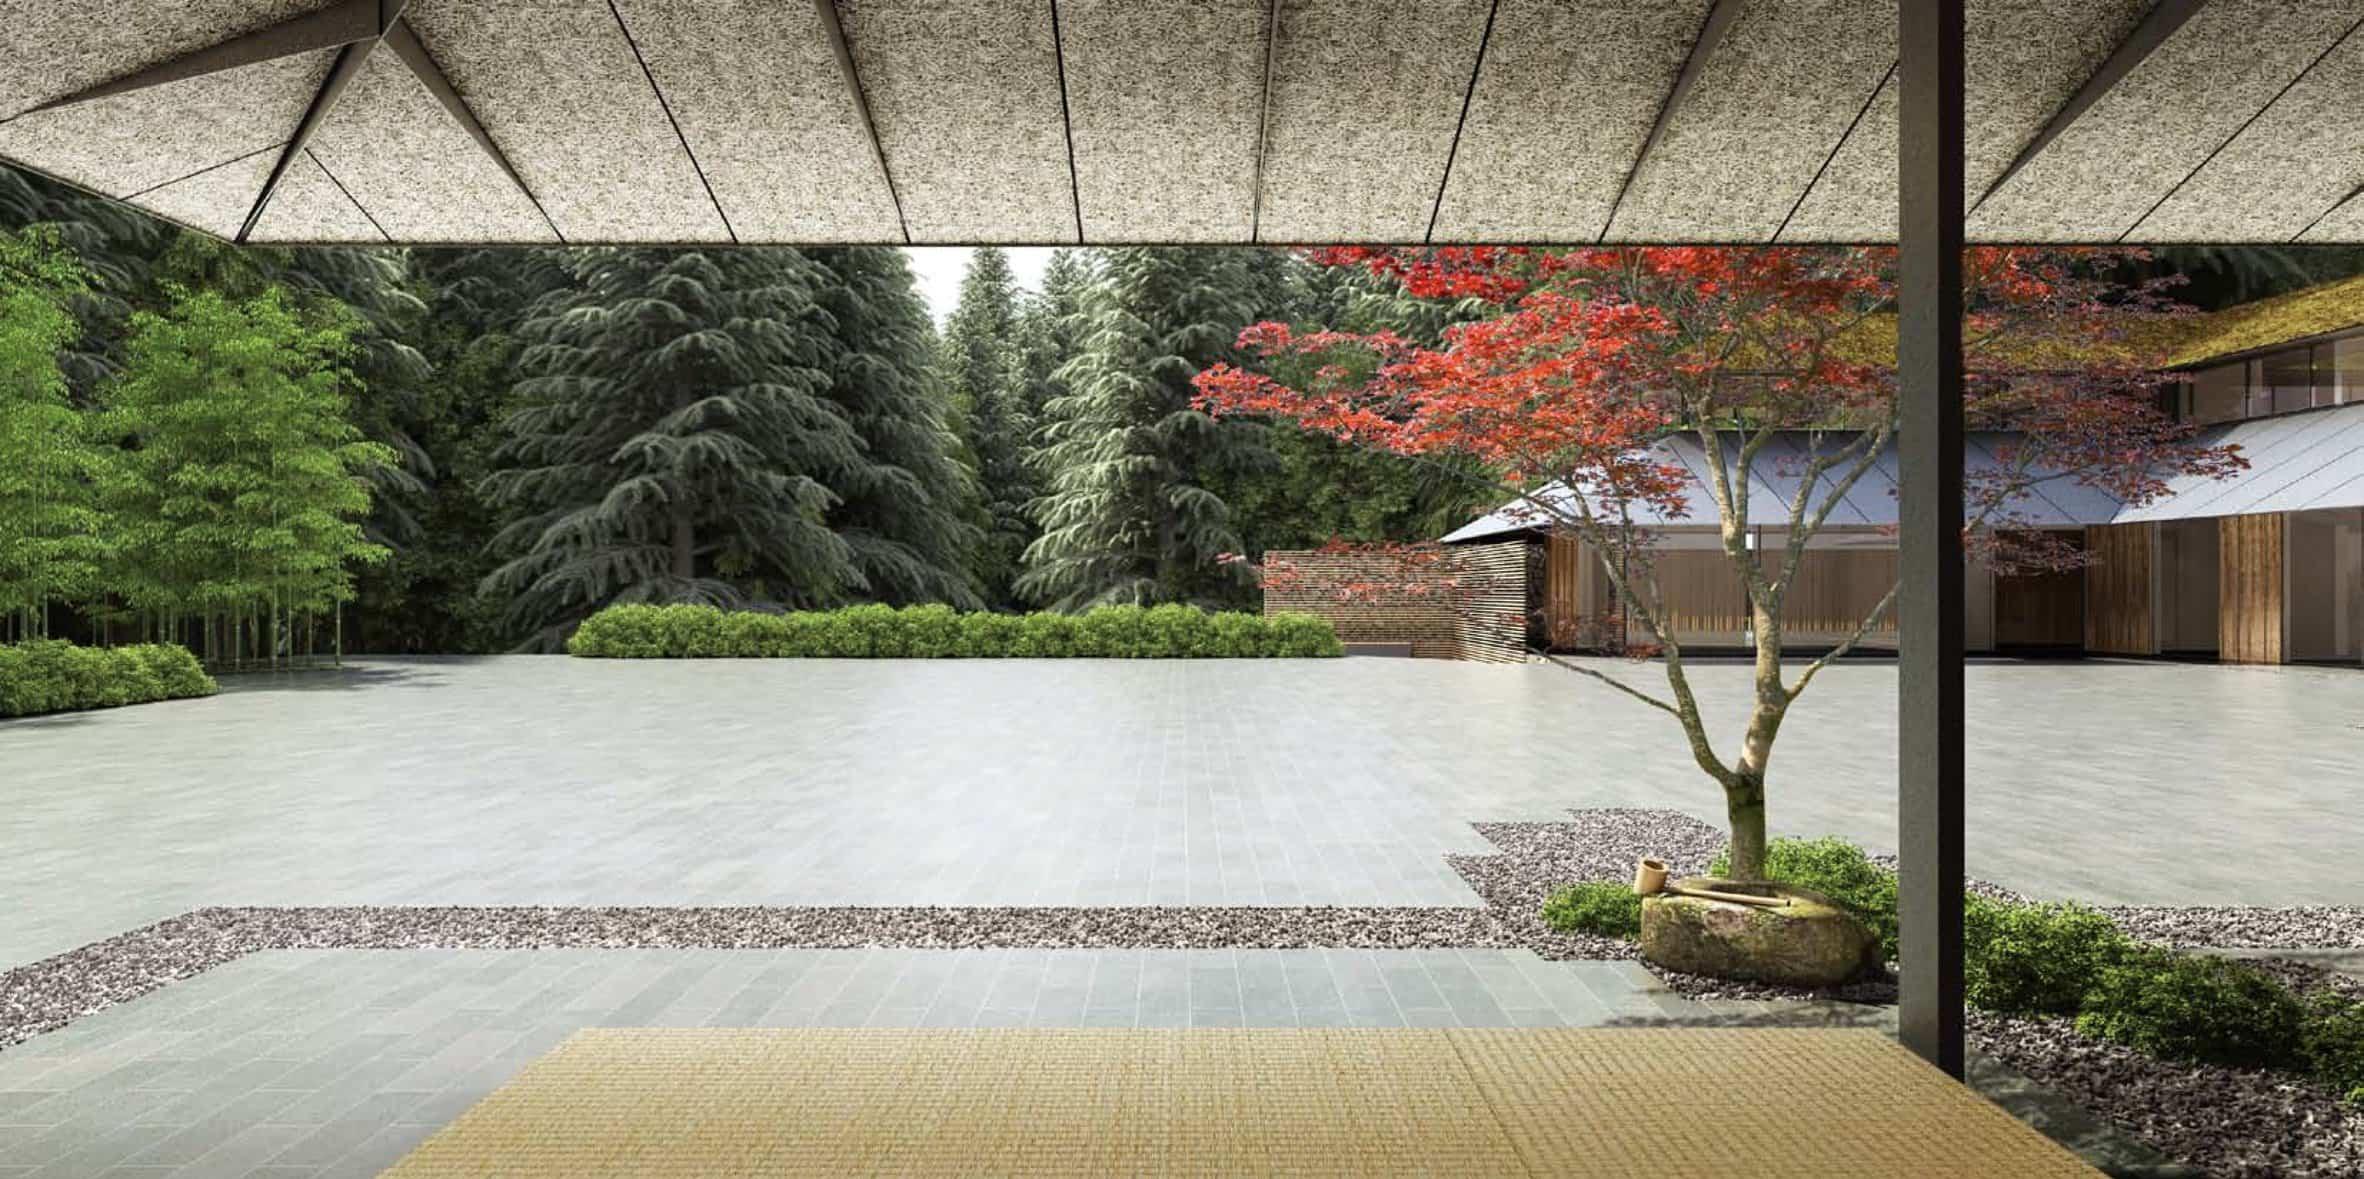 jardín japonés Kengo Kuma 2